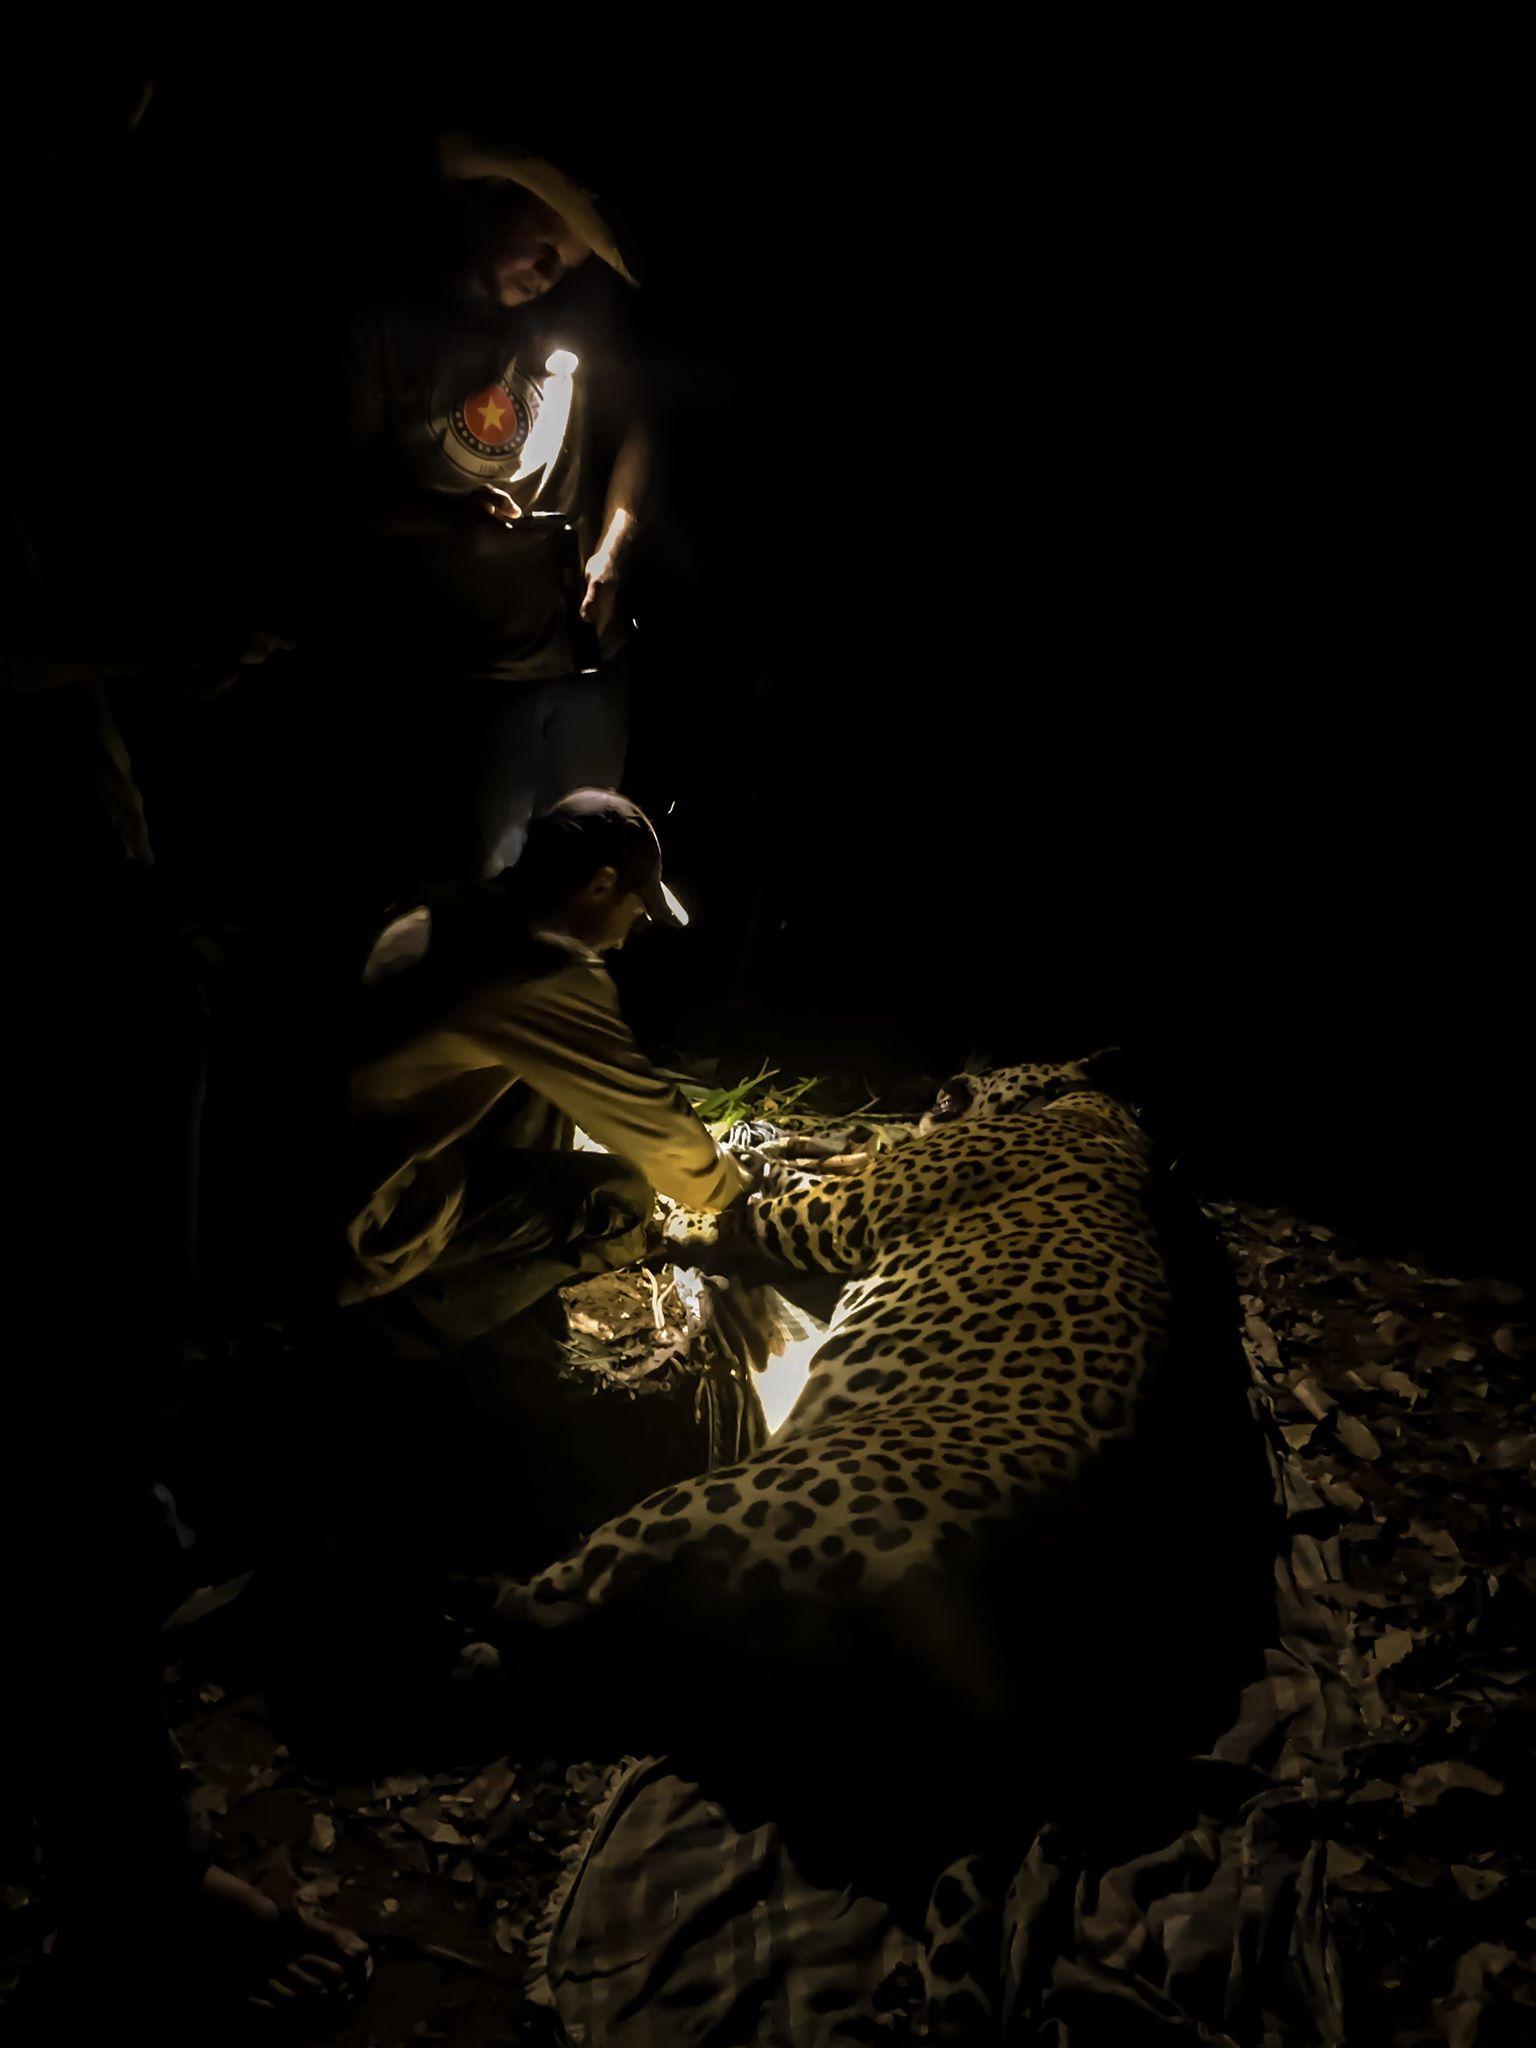 Collared Jaguar